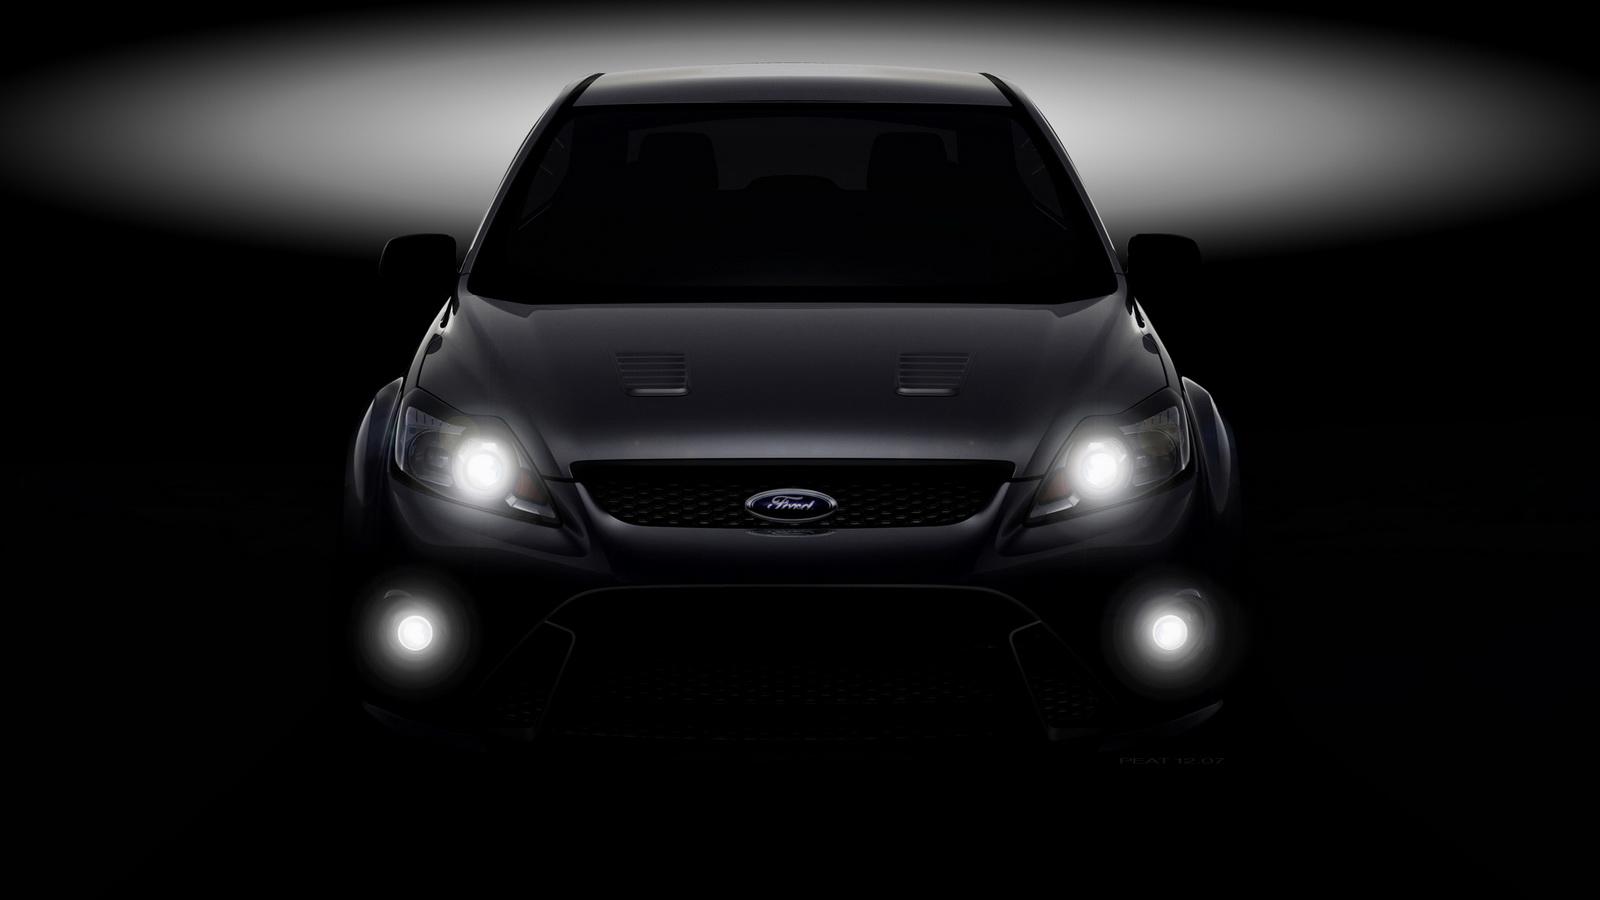 Ford focus rs teaser-01